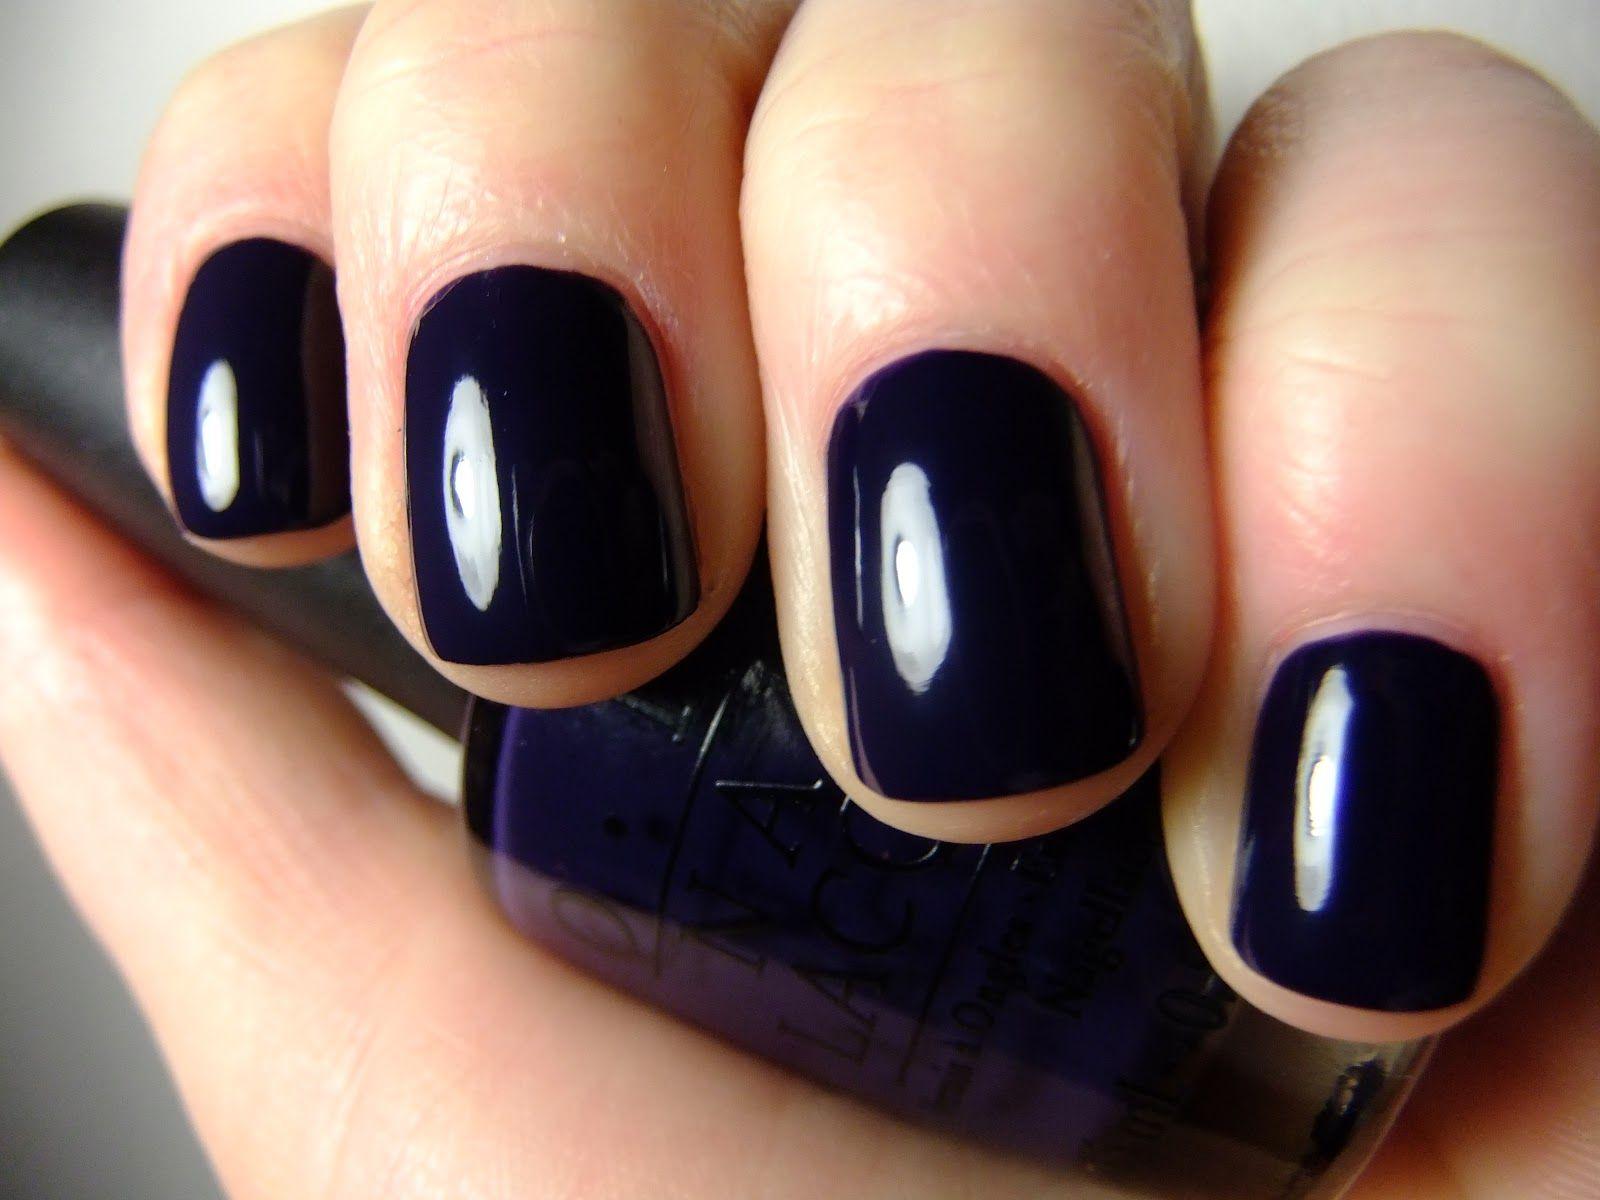 Dark Navy Blue Nail Polish Like Roadhouse Blues By Opi